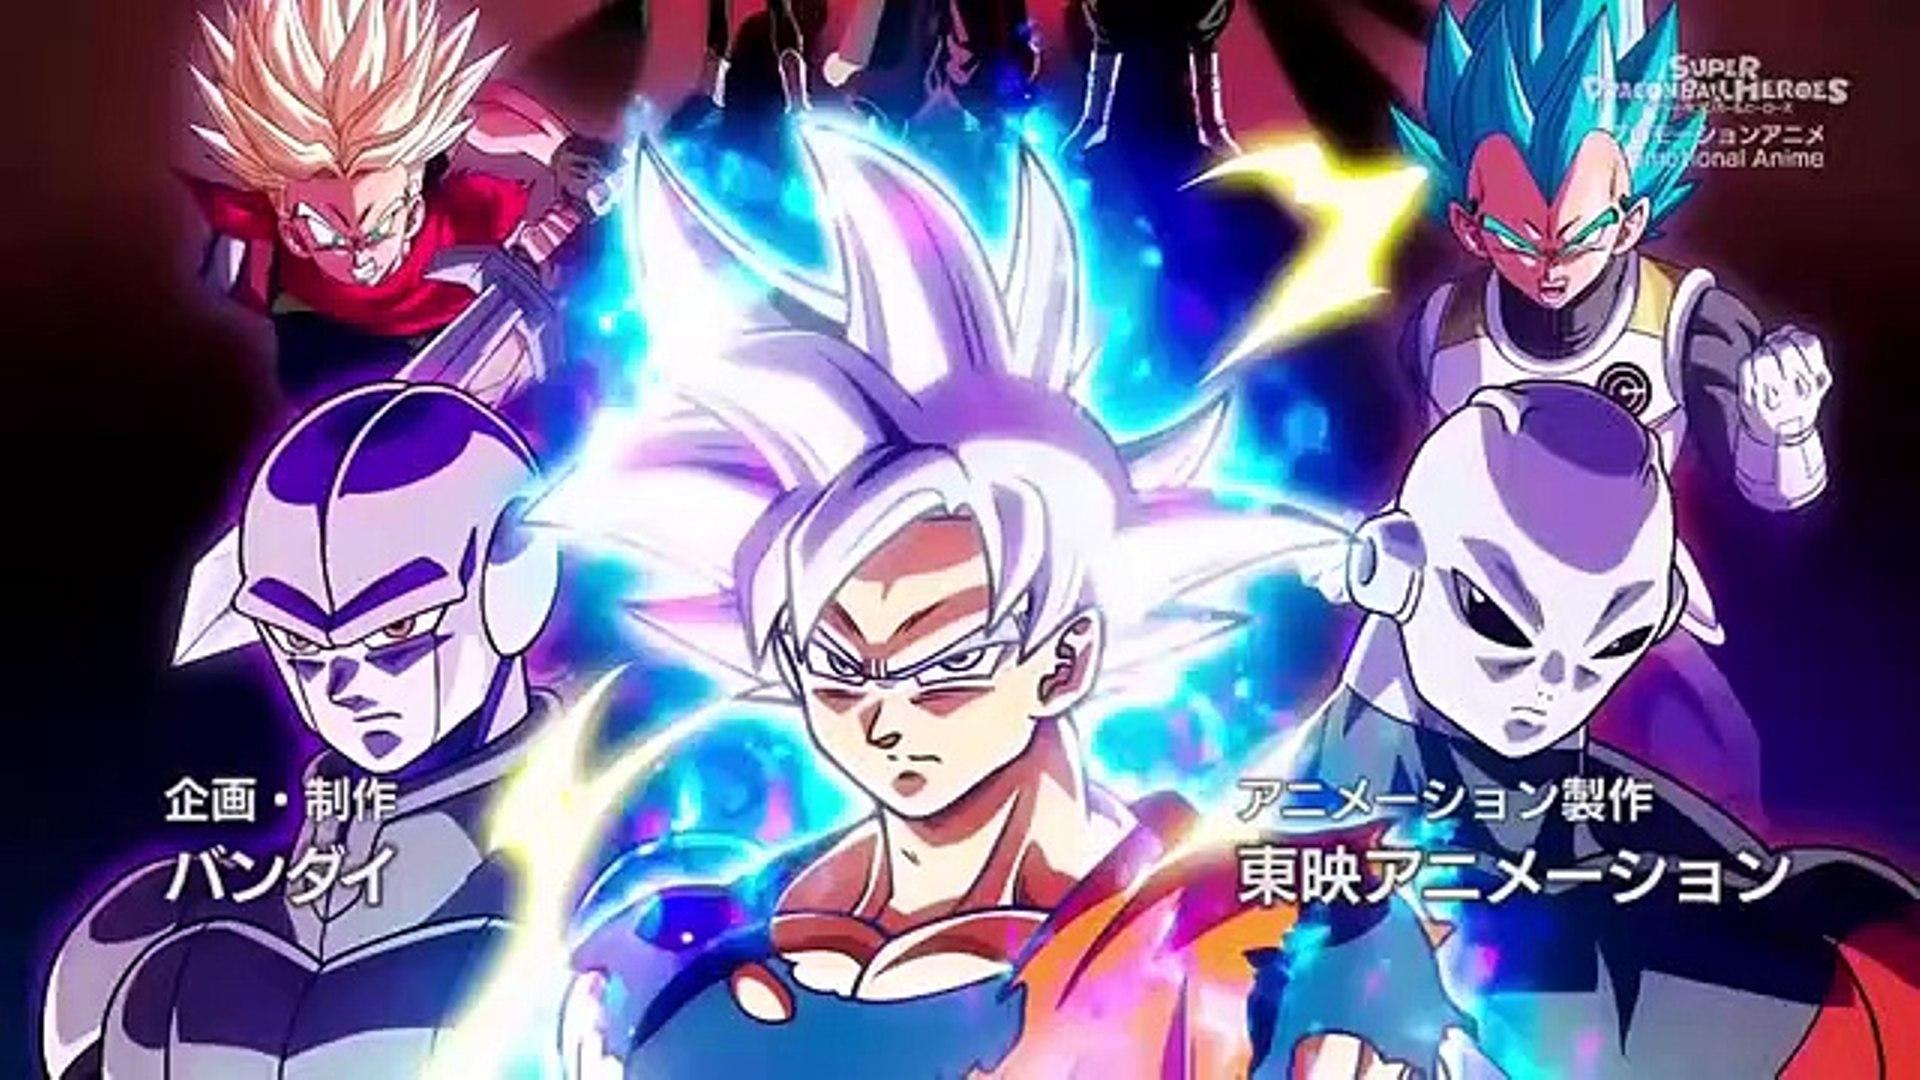 Super Dragon Ball Heroes Wallpapers Wallpaper Cave